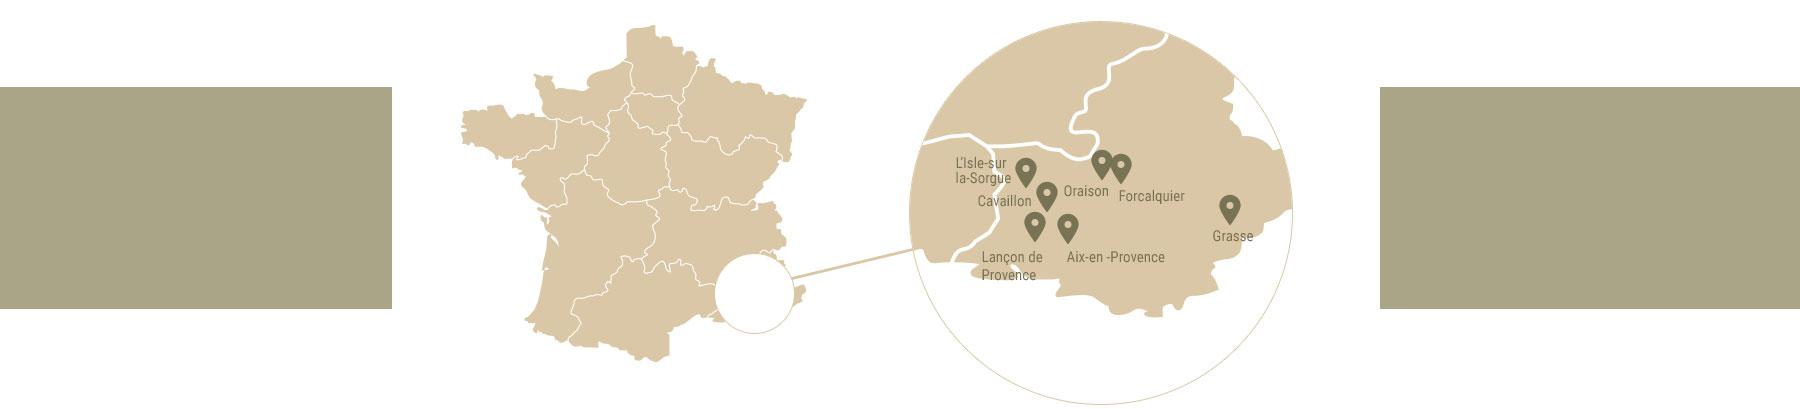 carte partenaires provence olivier de leos